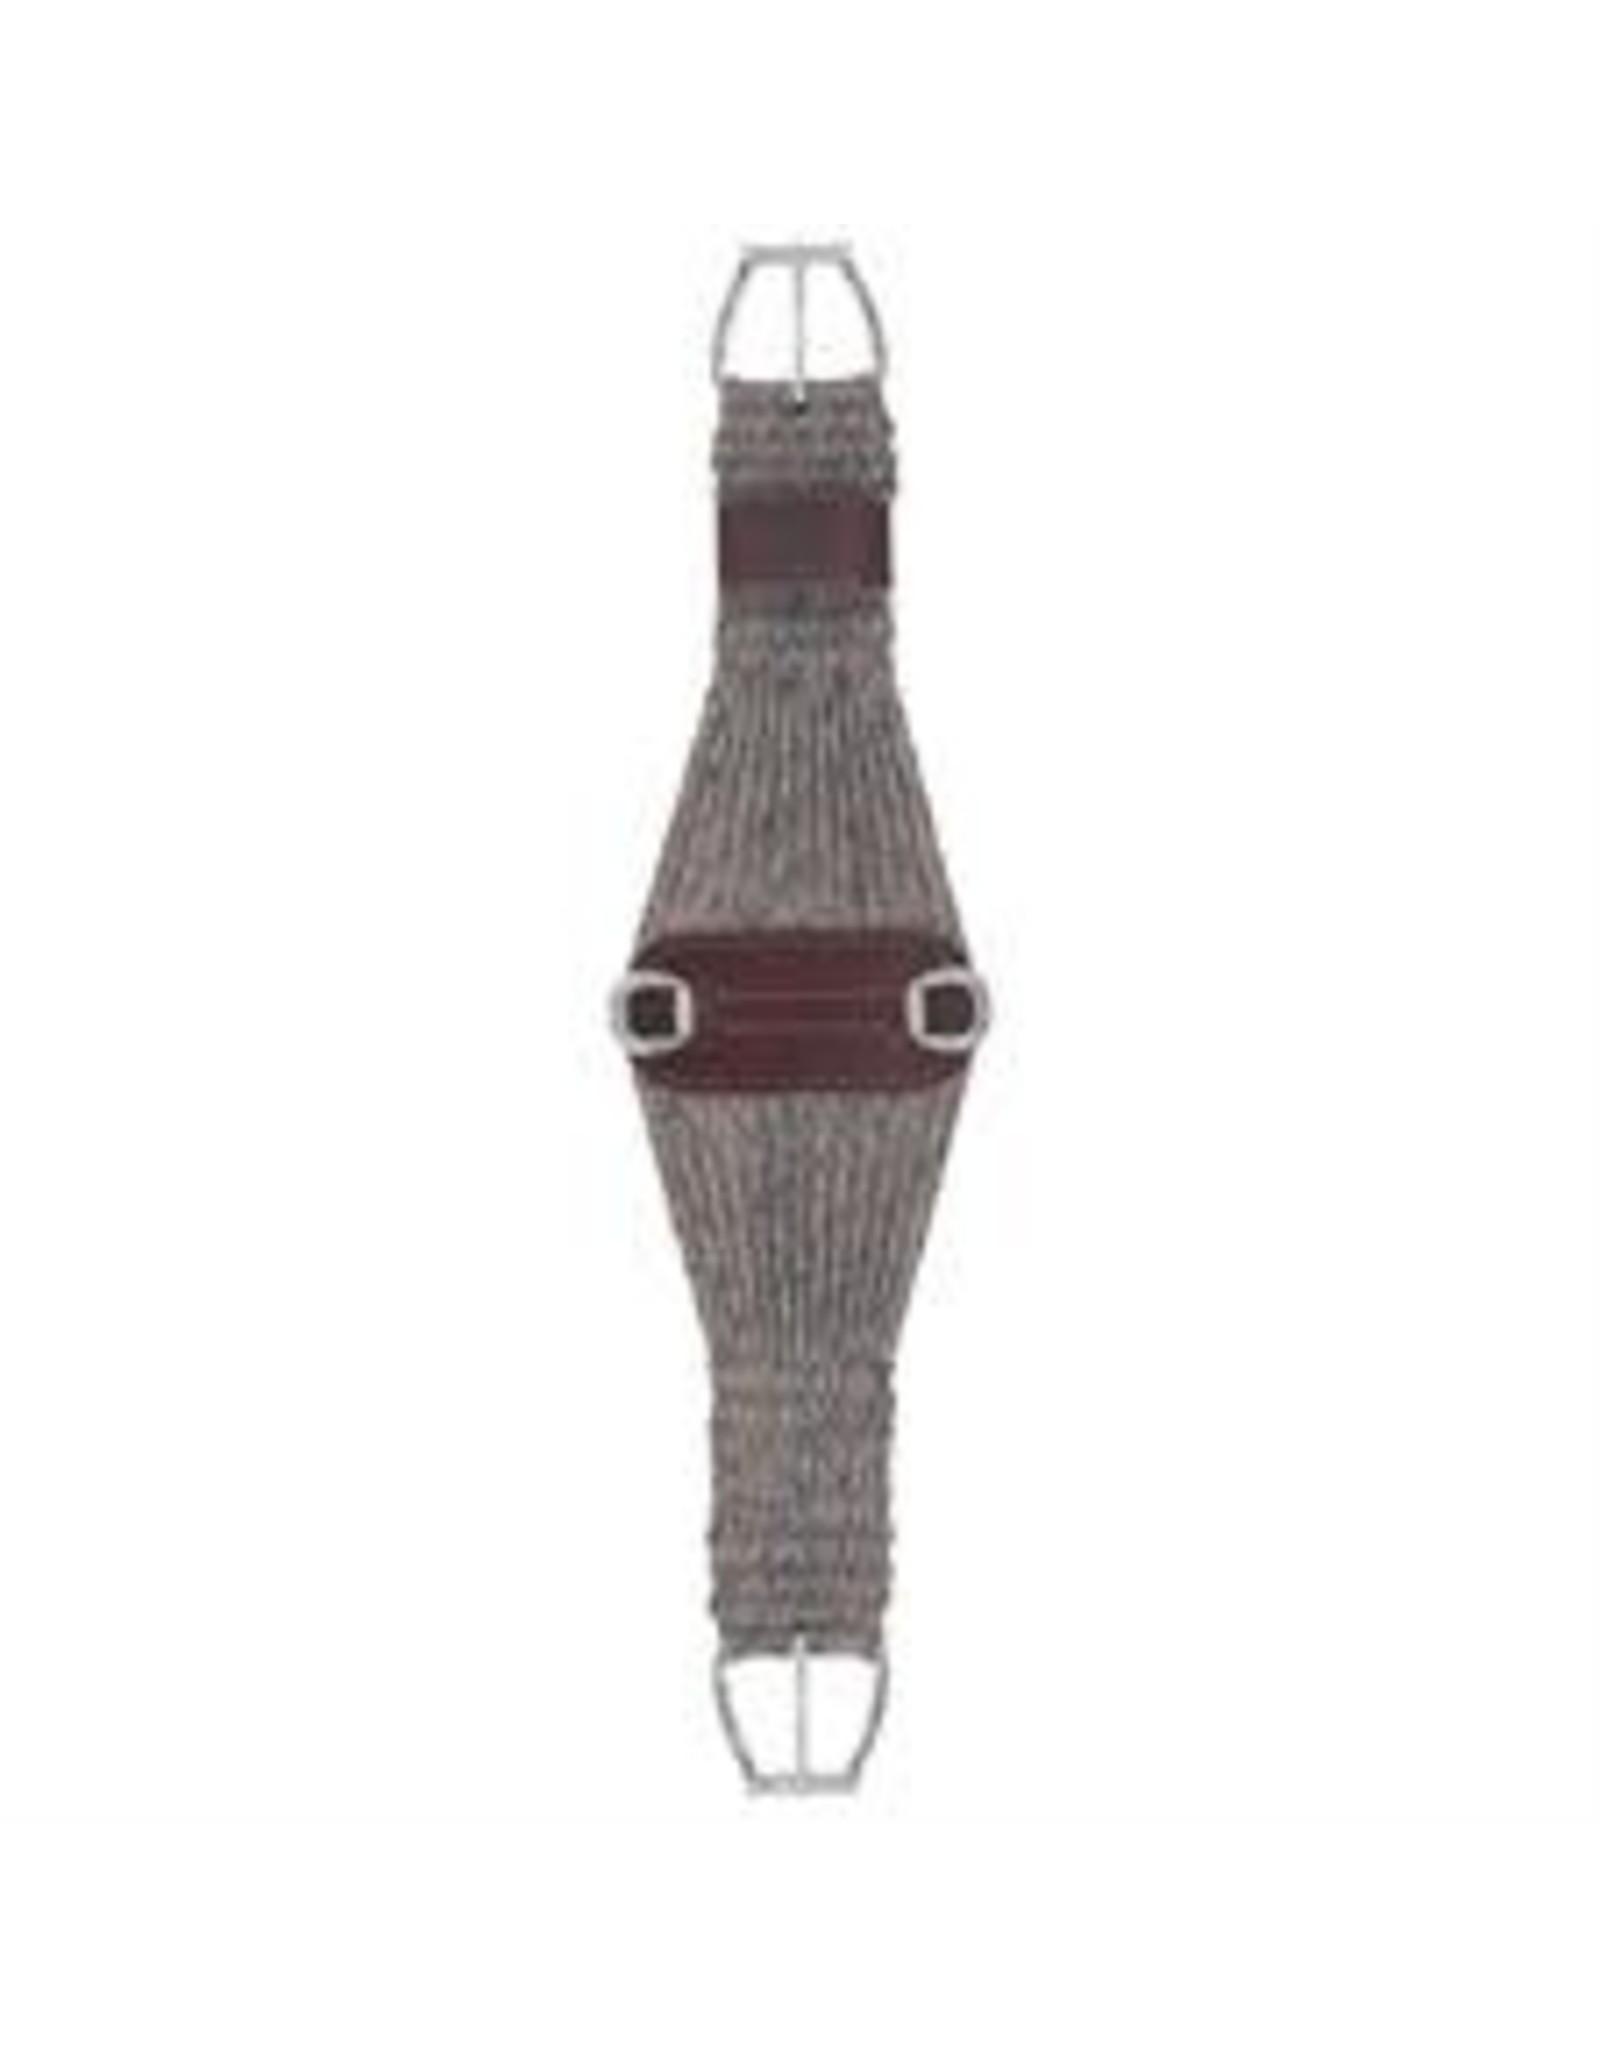 CIN* 100% Alpaca Roper Cinch 32''  35-2439-32   AAAA*P (fancy roller buckles and one side leather cinch holder)